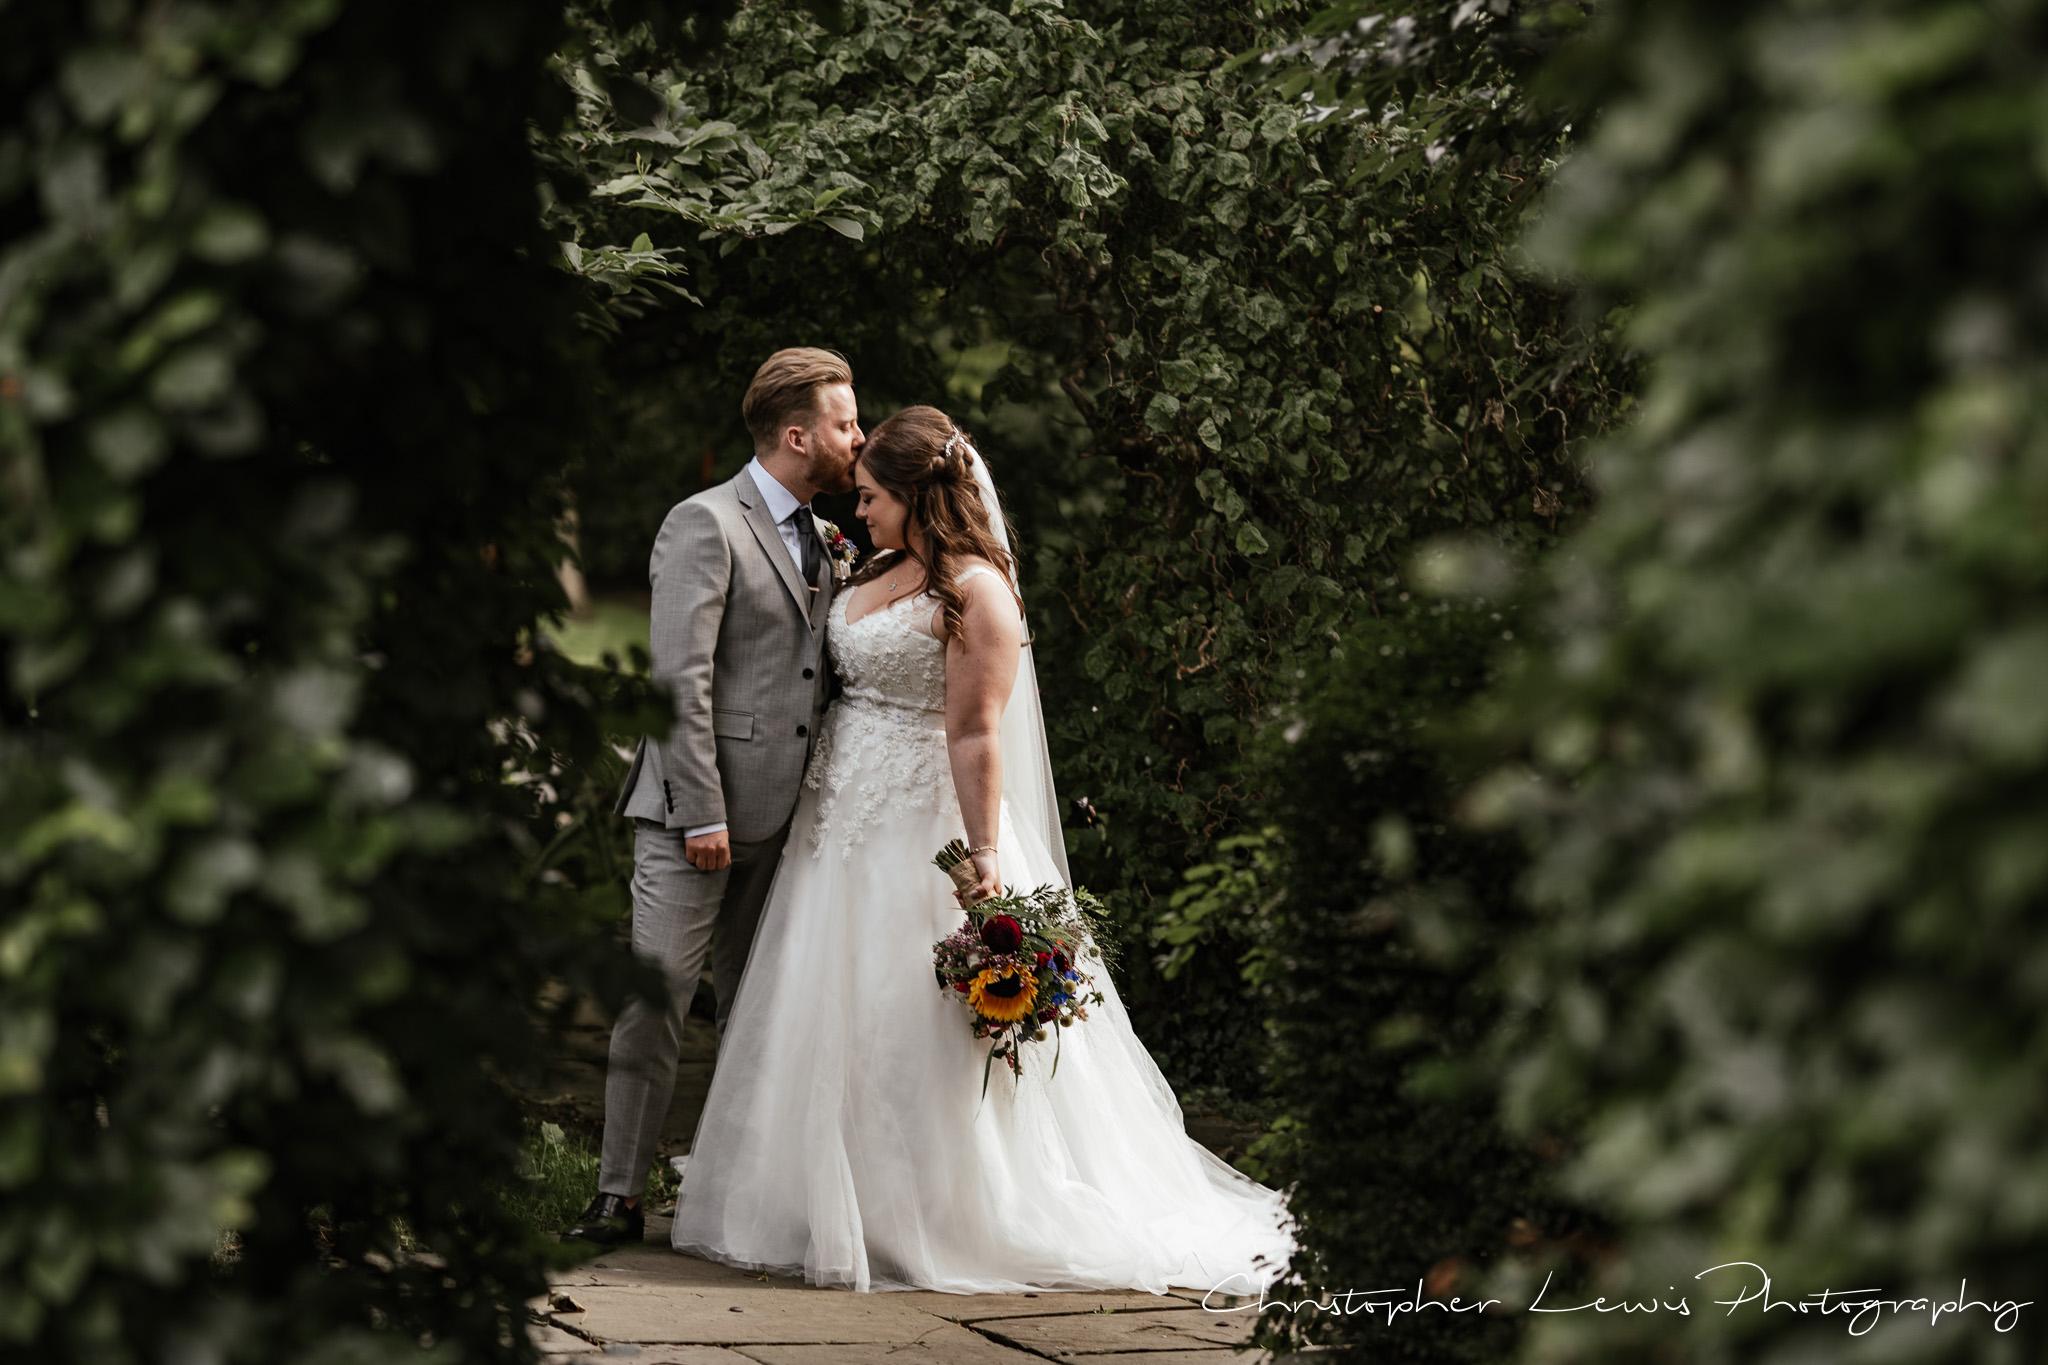 Samlesbury Hall Wedding bride and groom portrait